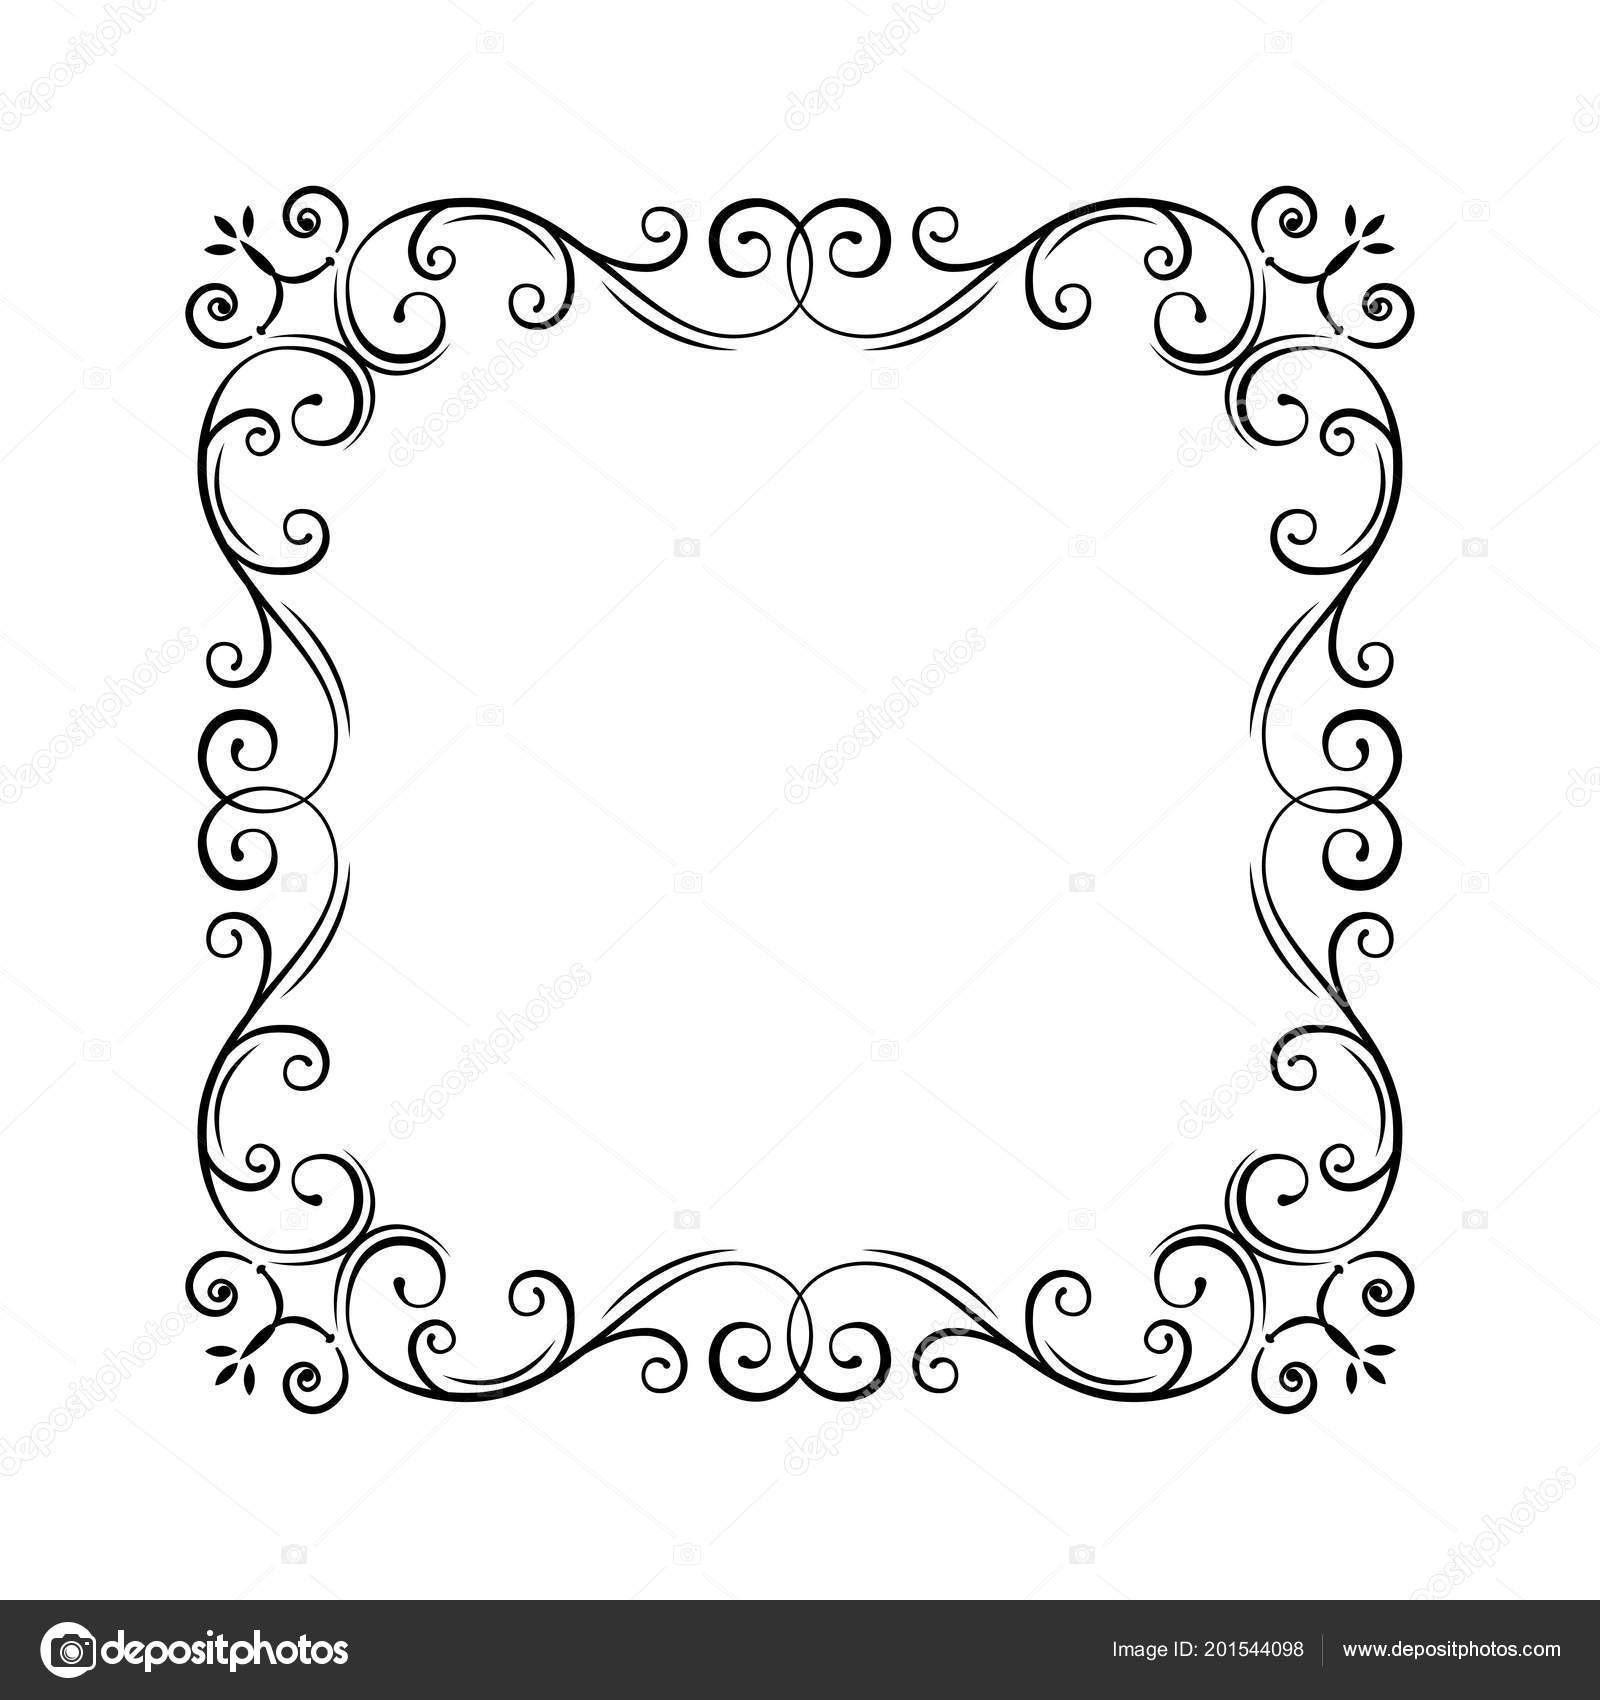 Flourish vintage frame filigree page border swirls curls flourish vintage frame filigree page border swirls curls flourish pattern wedding invitations greeting card certificates vector illustration stopboris Image collections